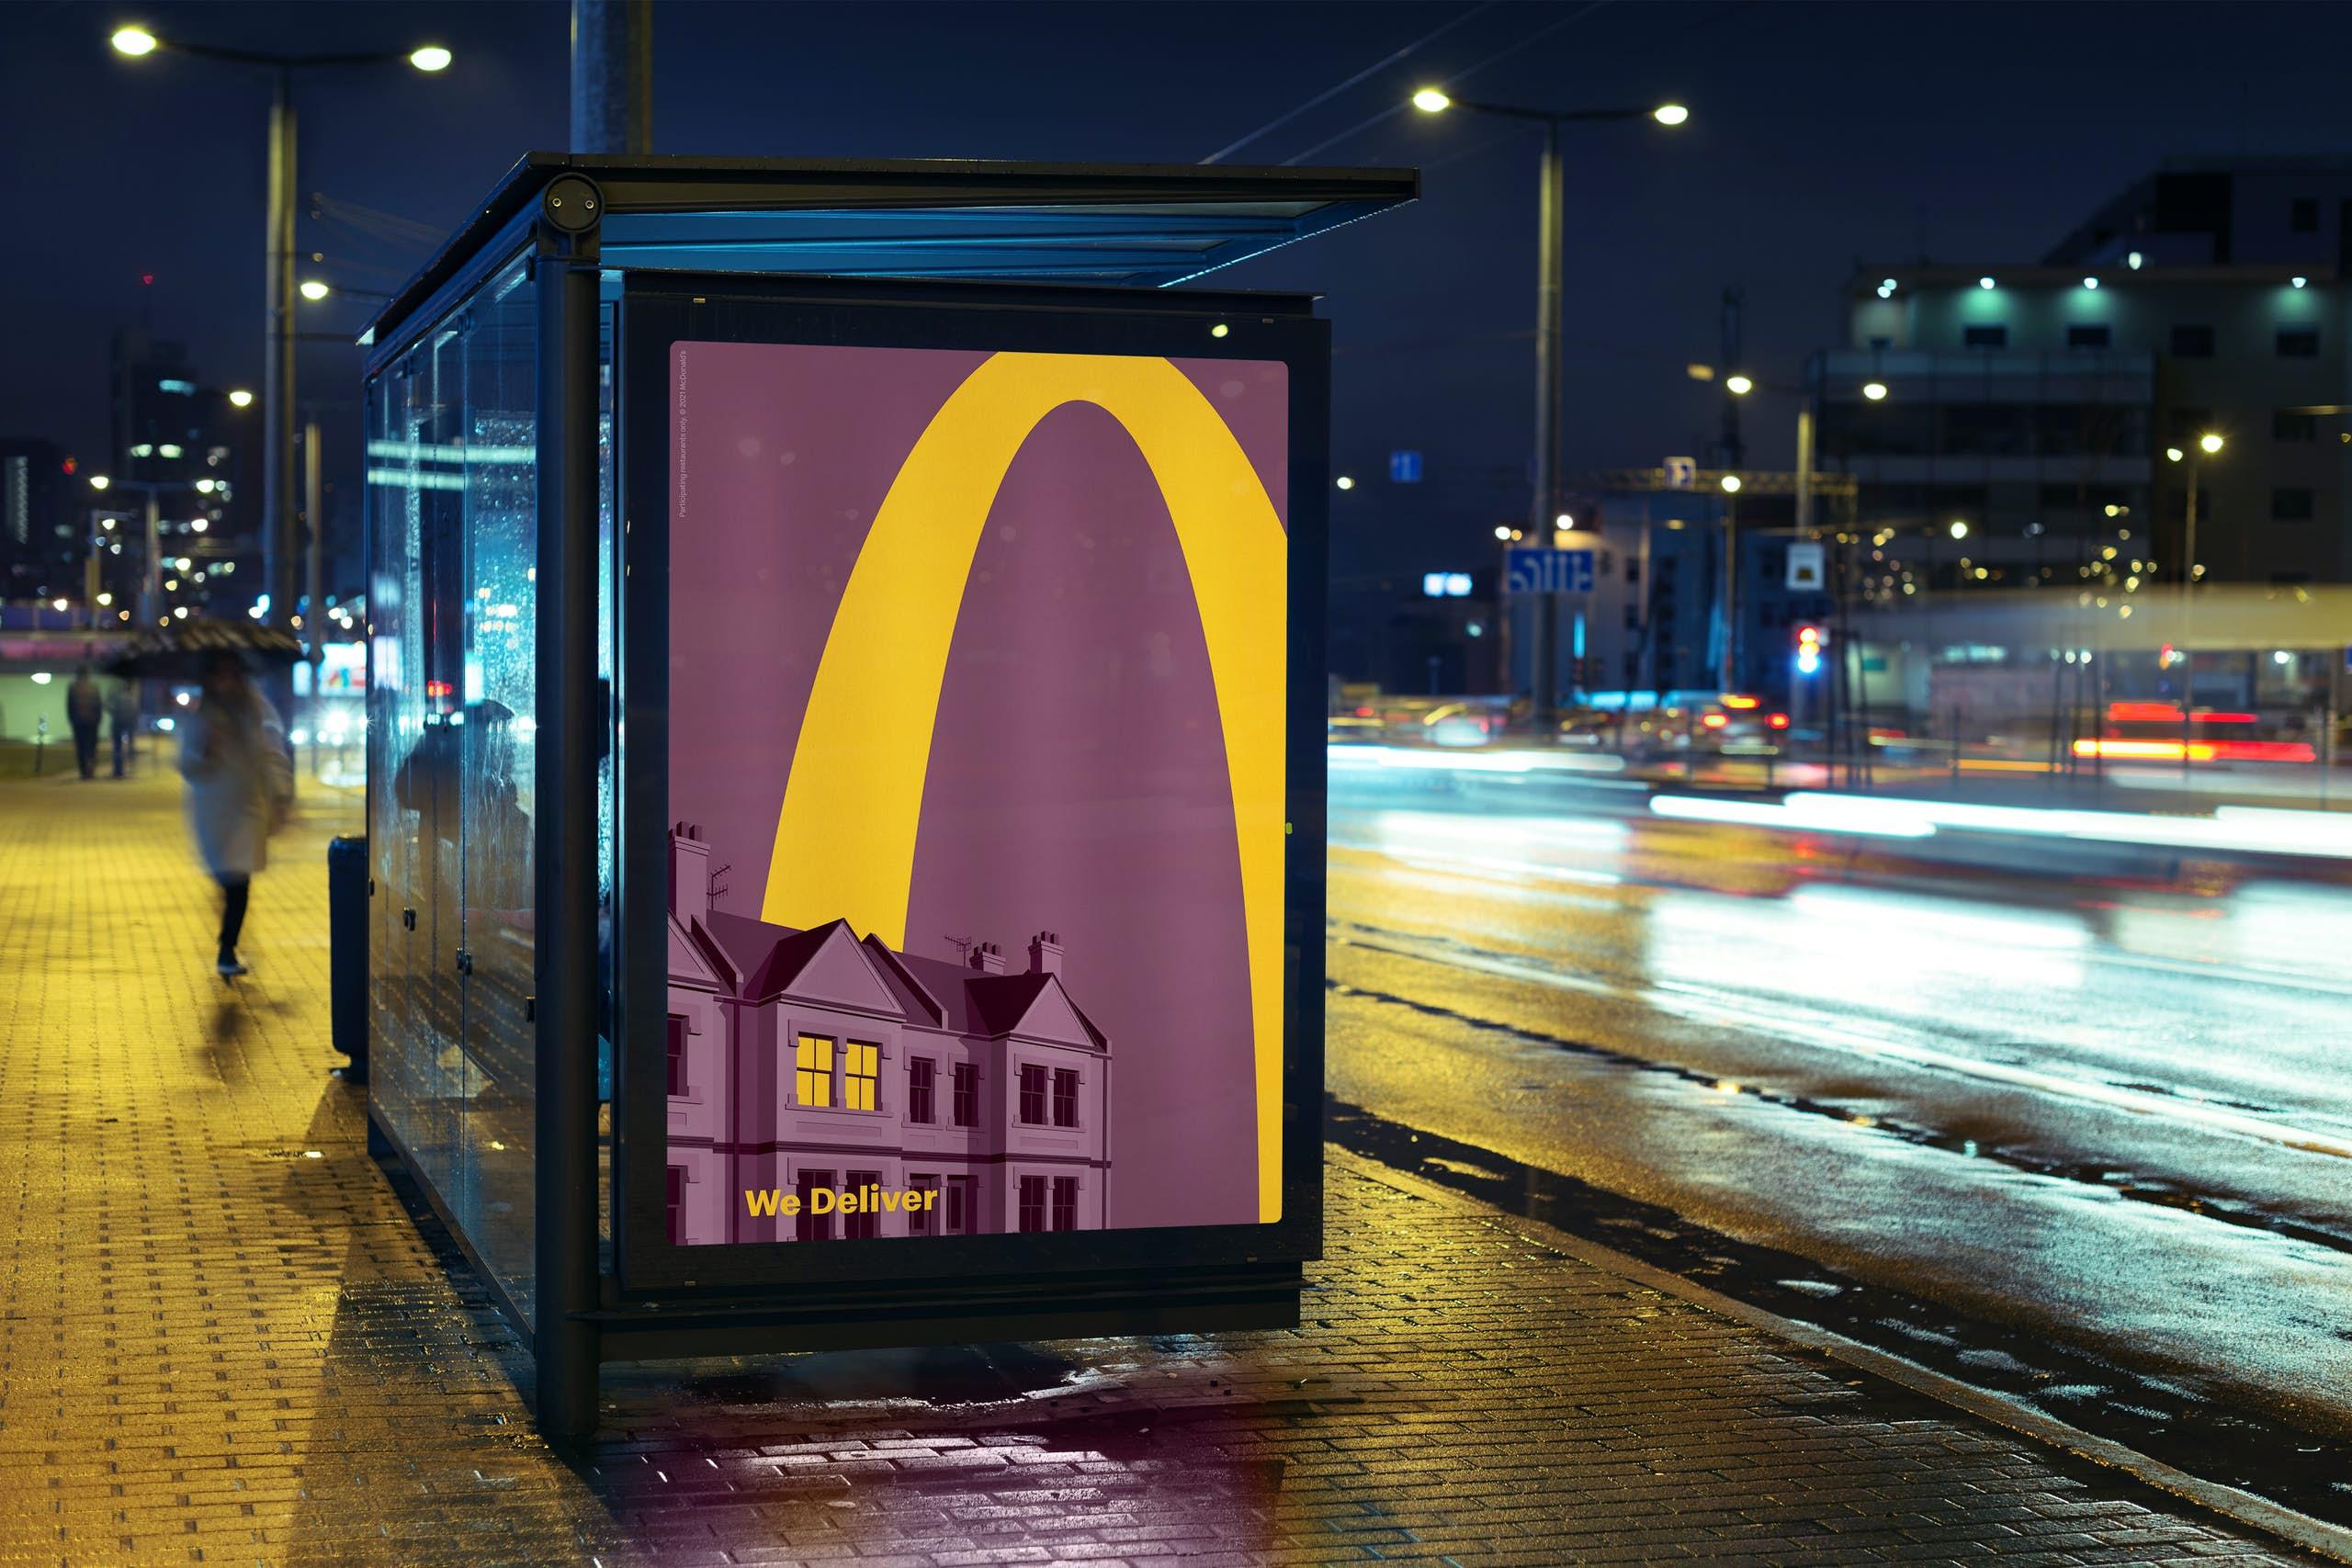 McDonalds Lights On 2